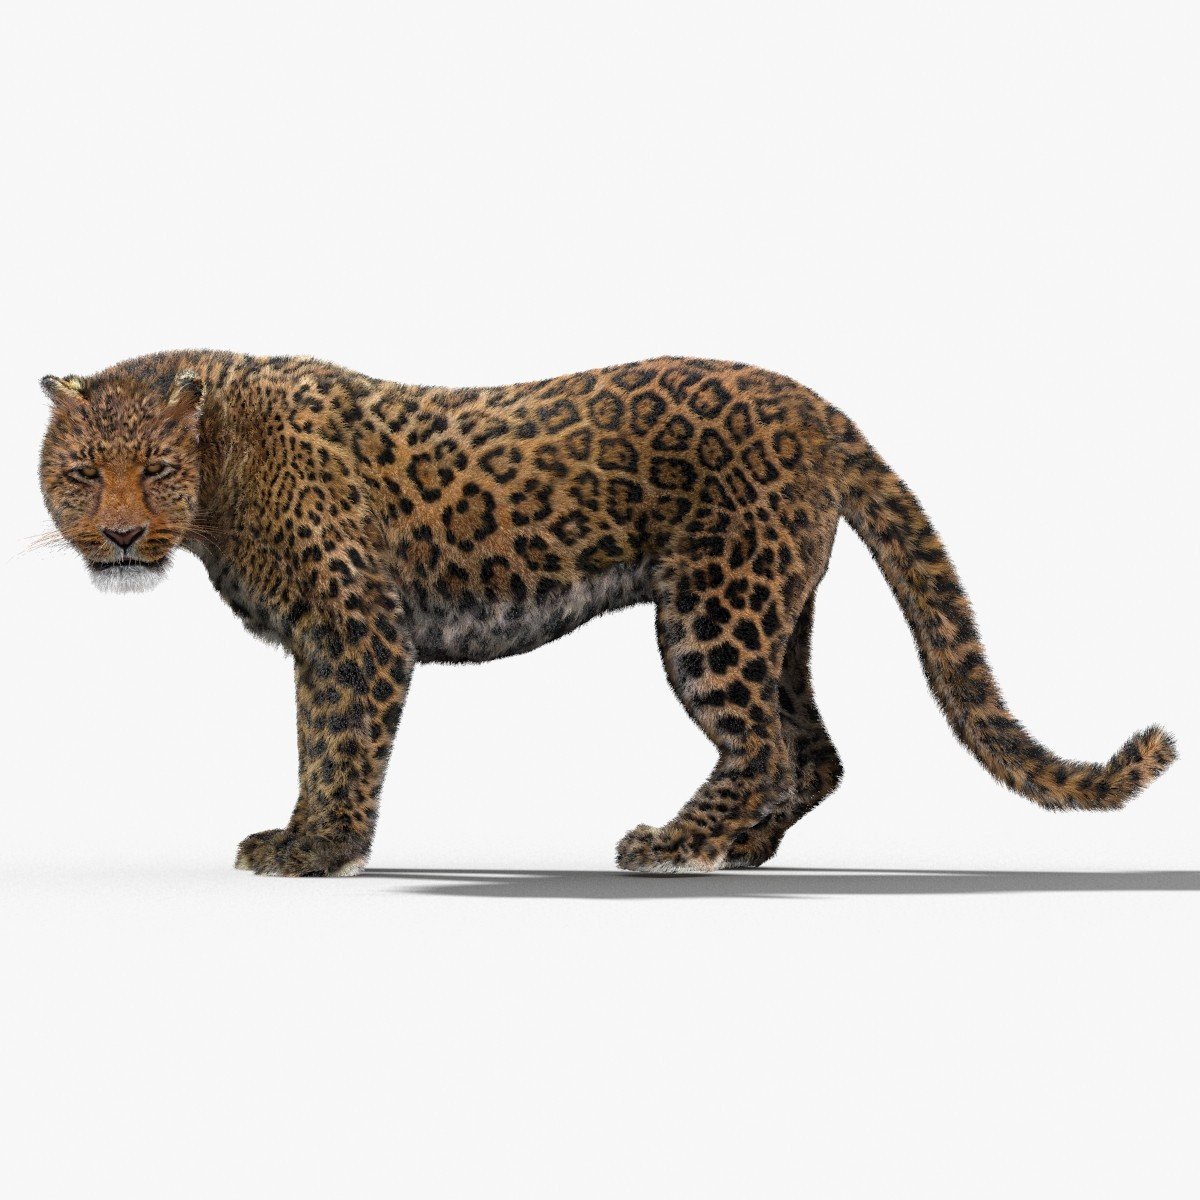 Leopard-3D-model-animated-fur-00.jpg